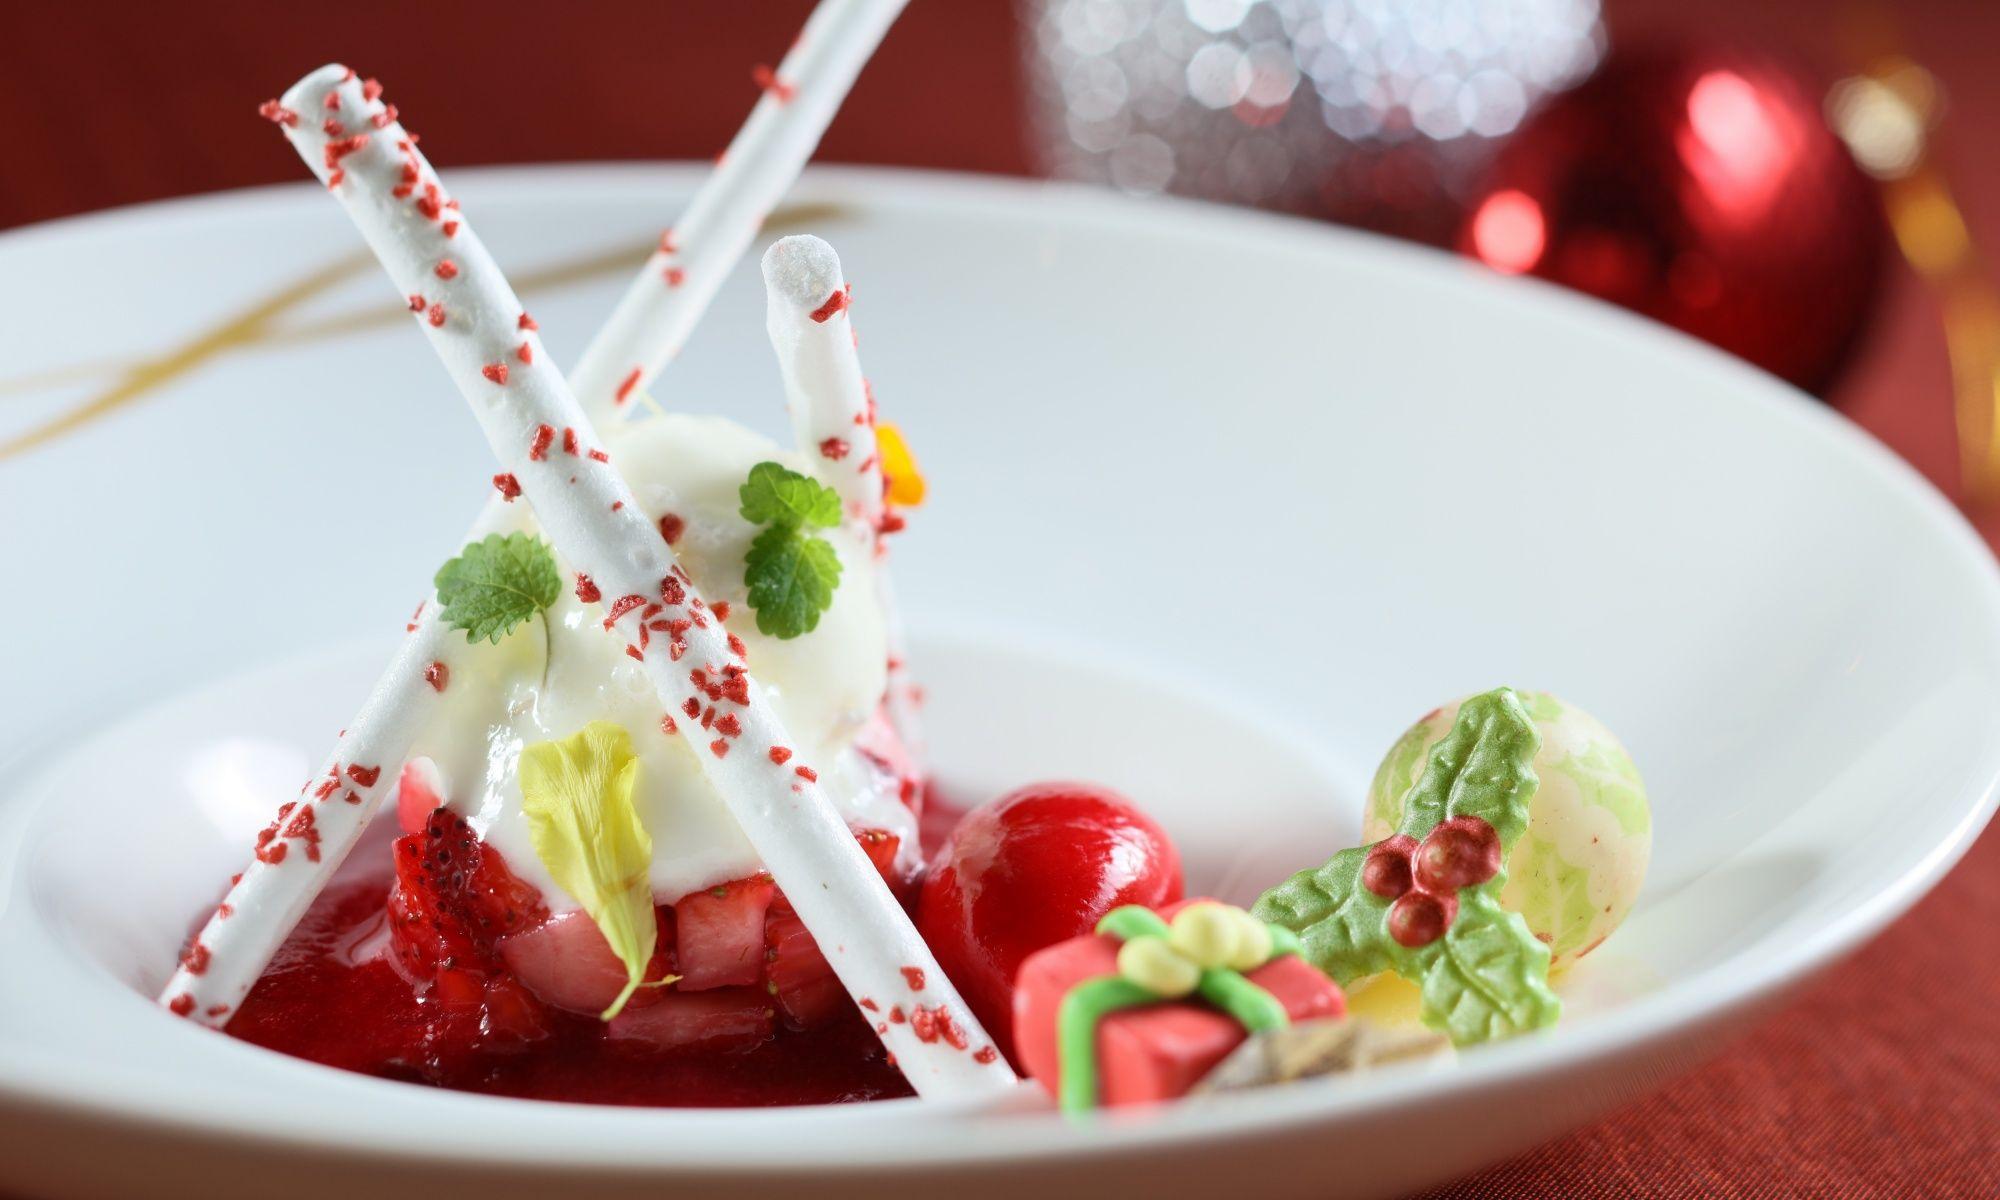 Tsim Sha Tsui's Cucina Presents A Glittering Christmas